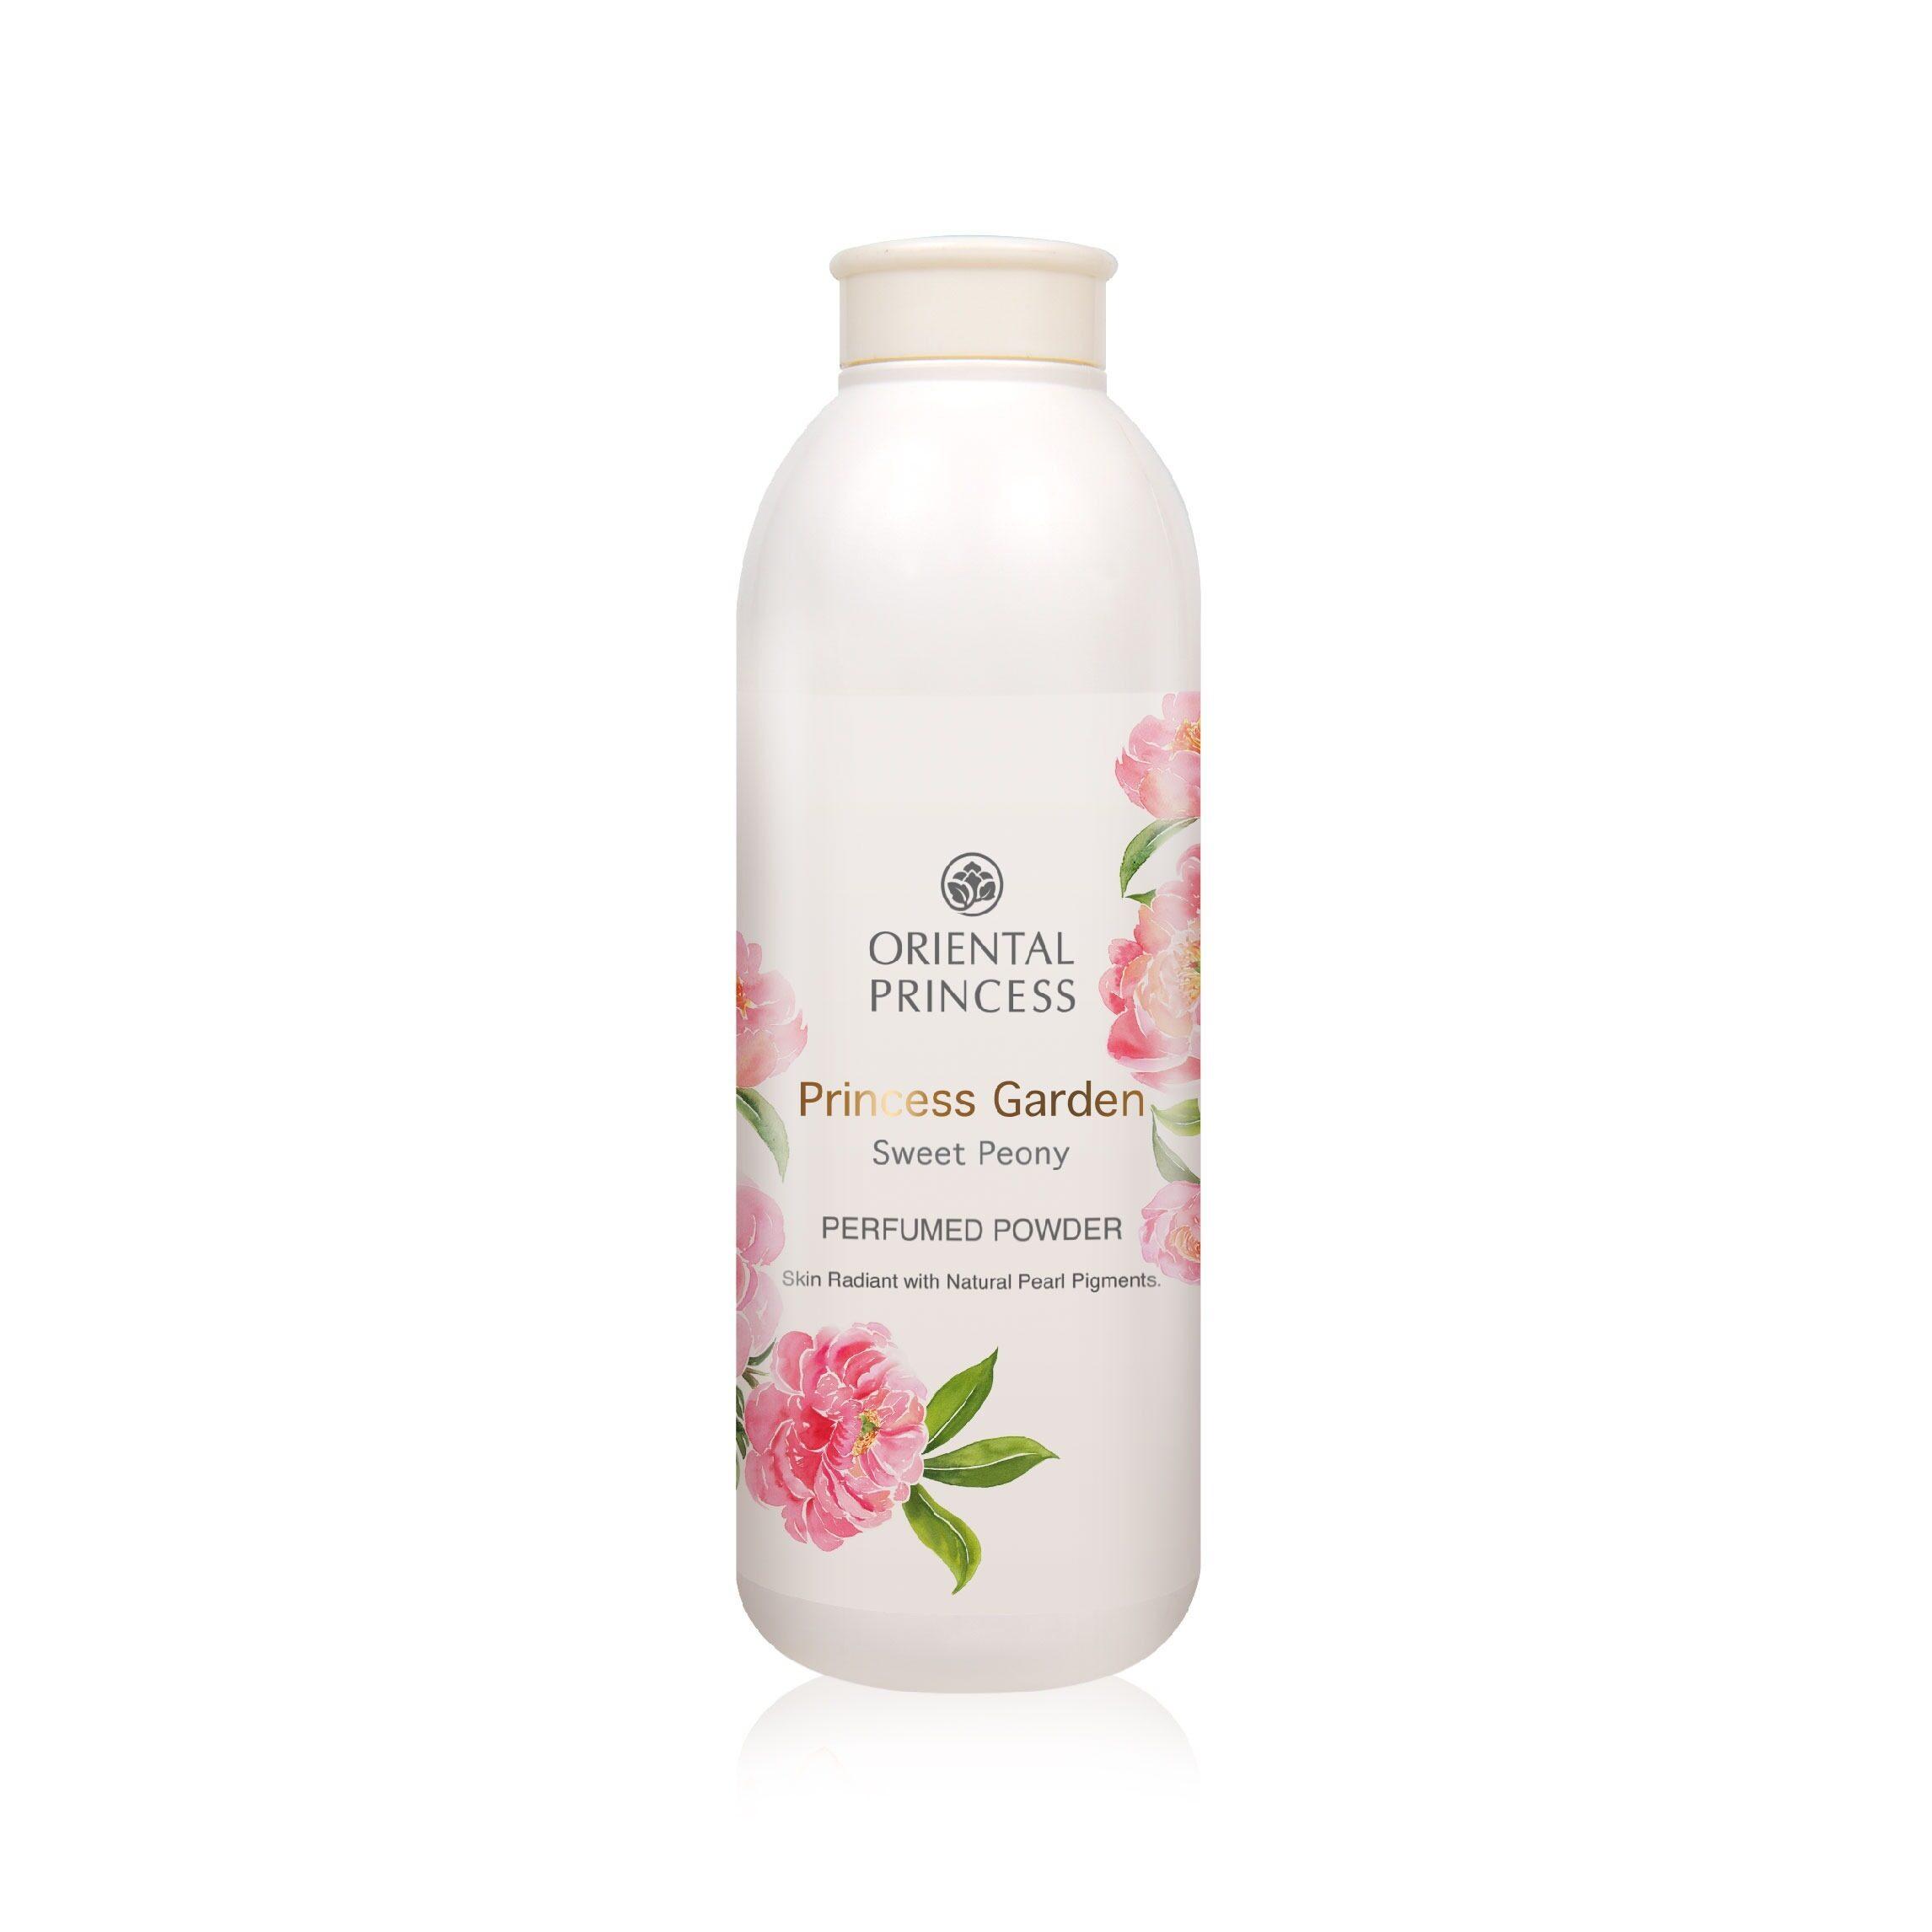 Oriental Princess, Princess Garden Sweet Peony Perfumed Powder แป้งฝุ่นหอมผสมประกายมุกสีชมพู.